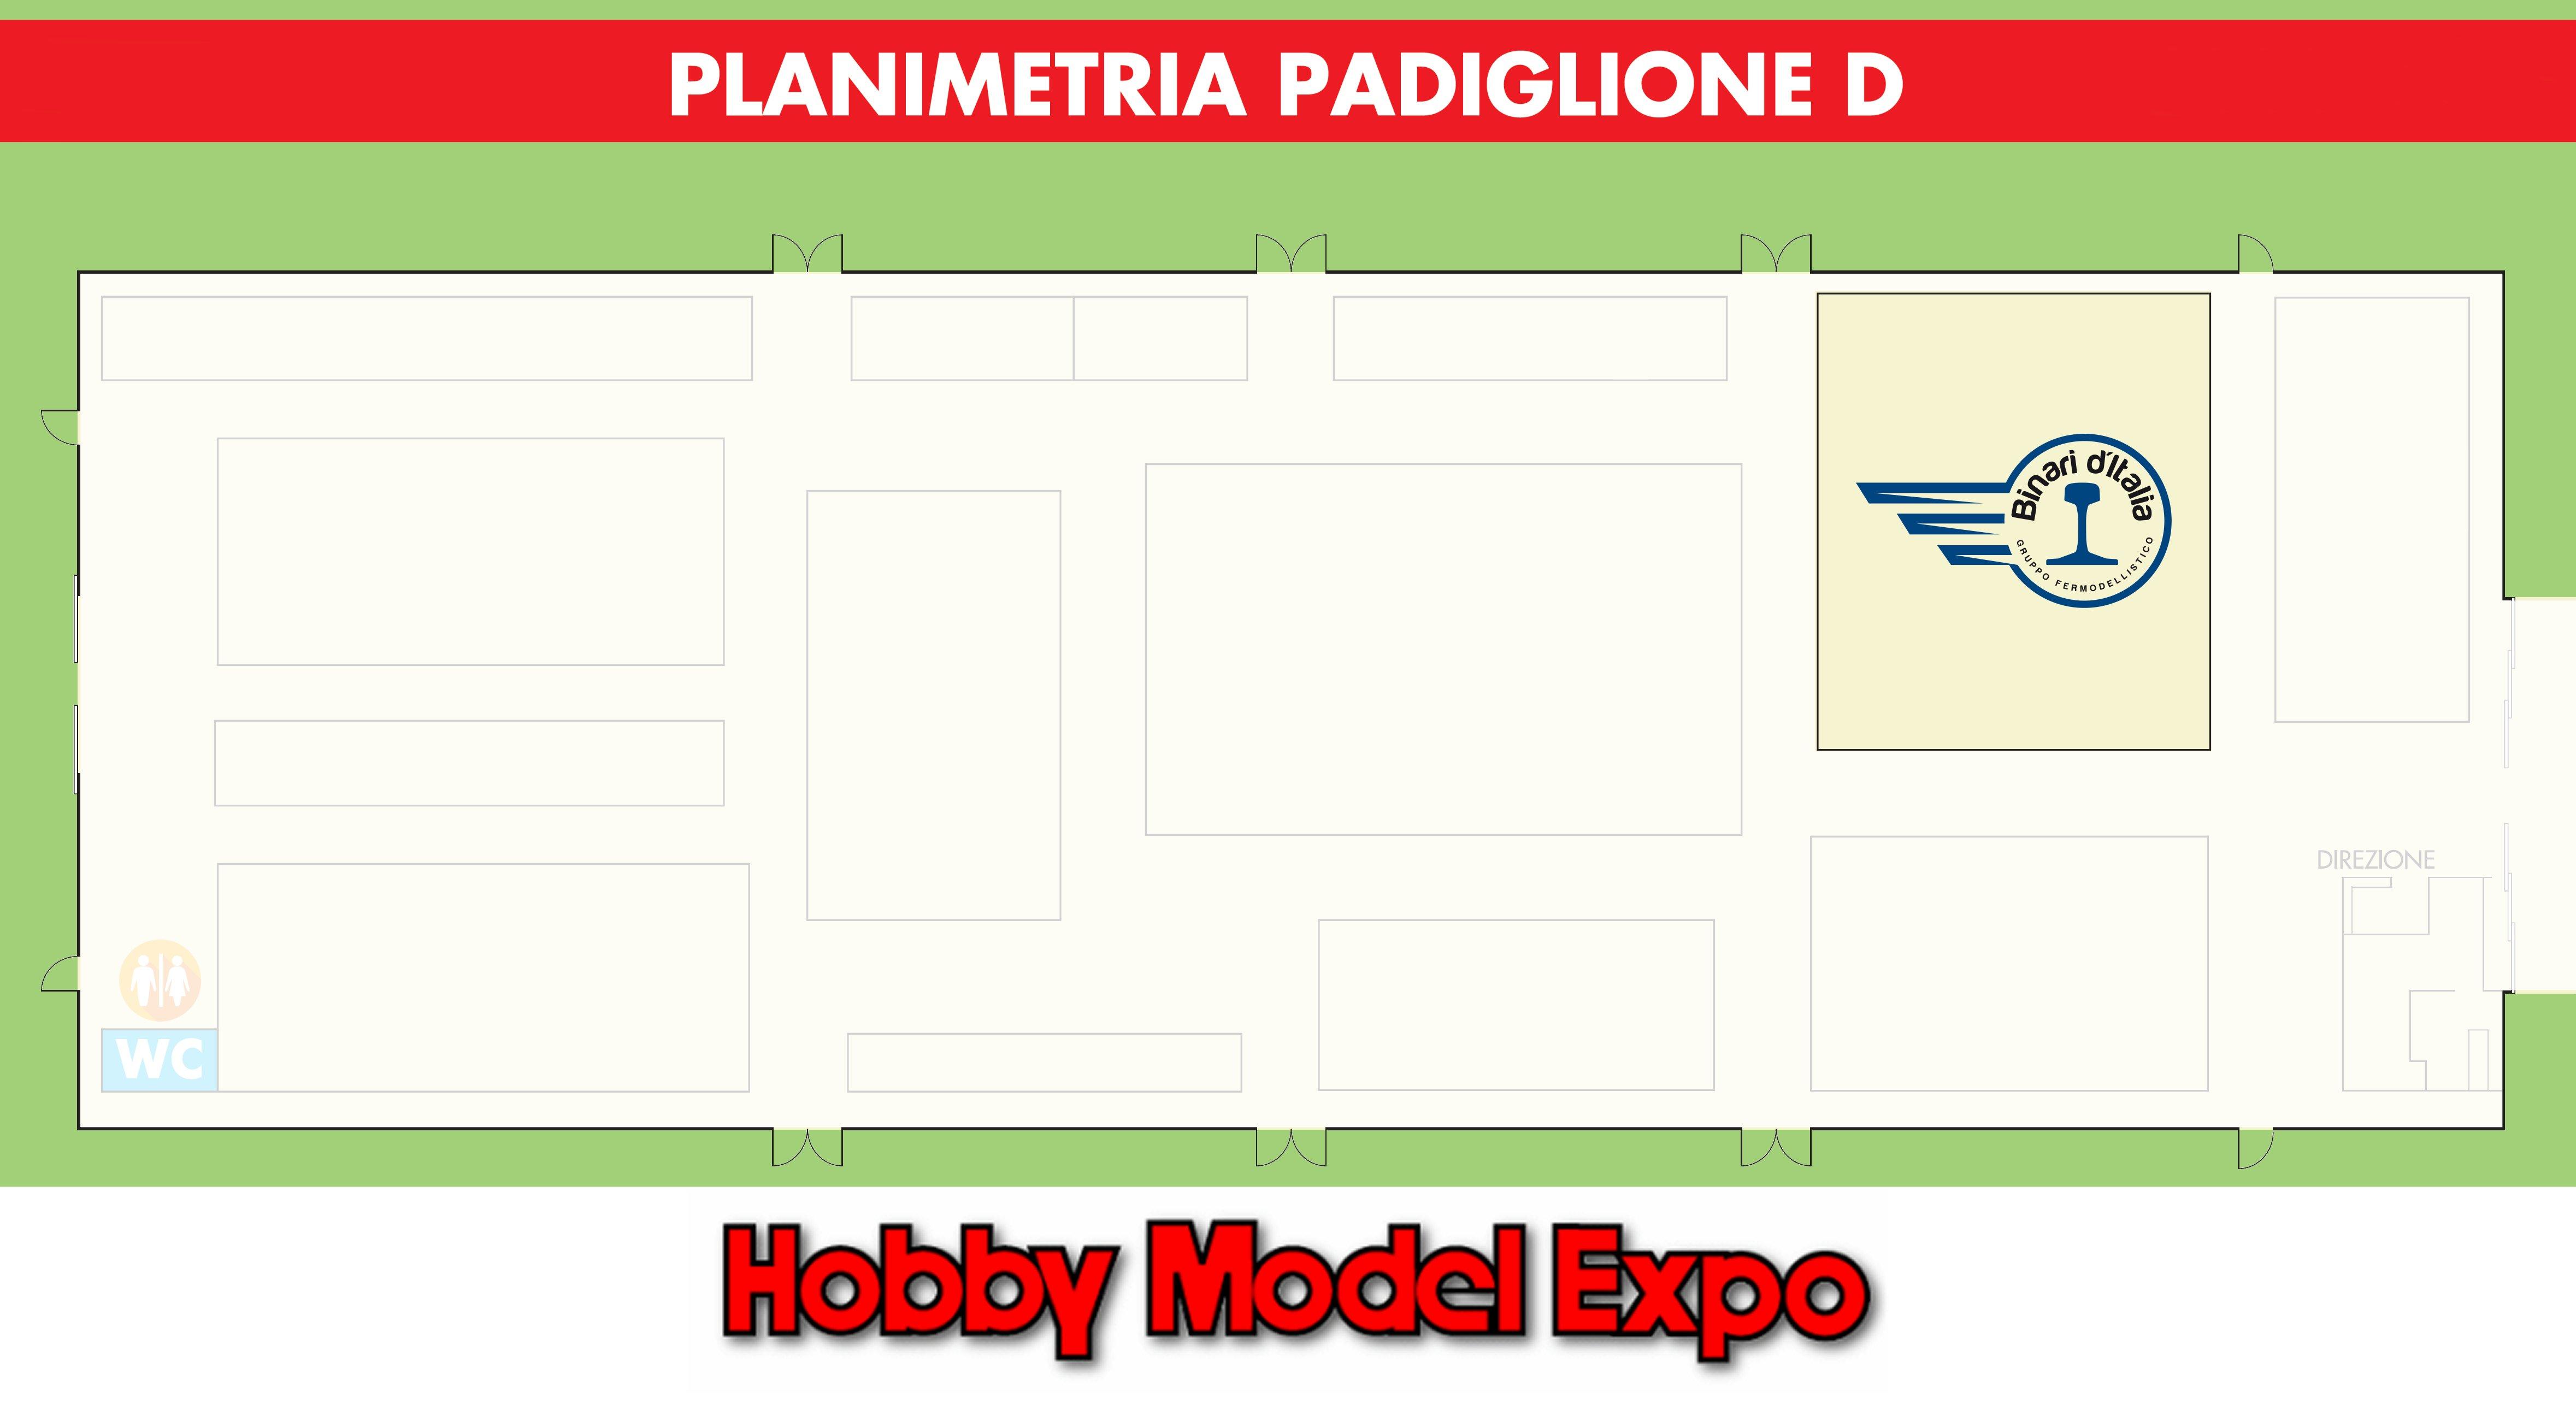 PIANTA_PAD_HME_18 - Pad D